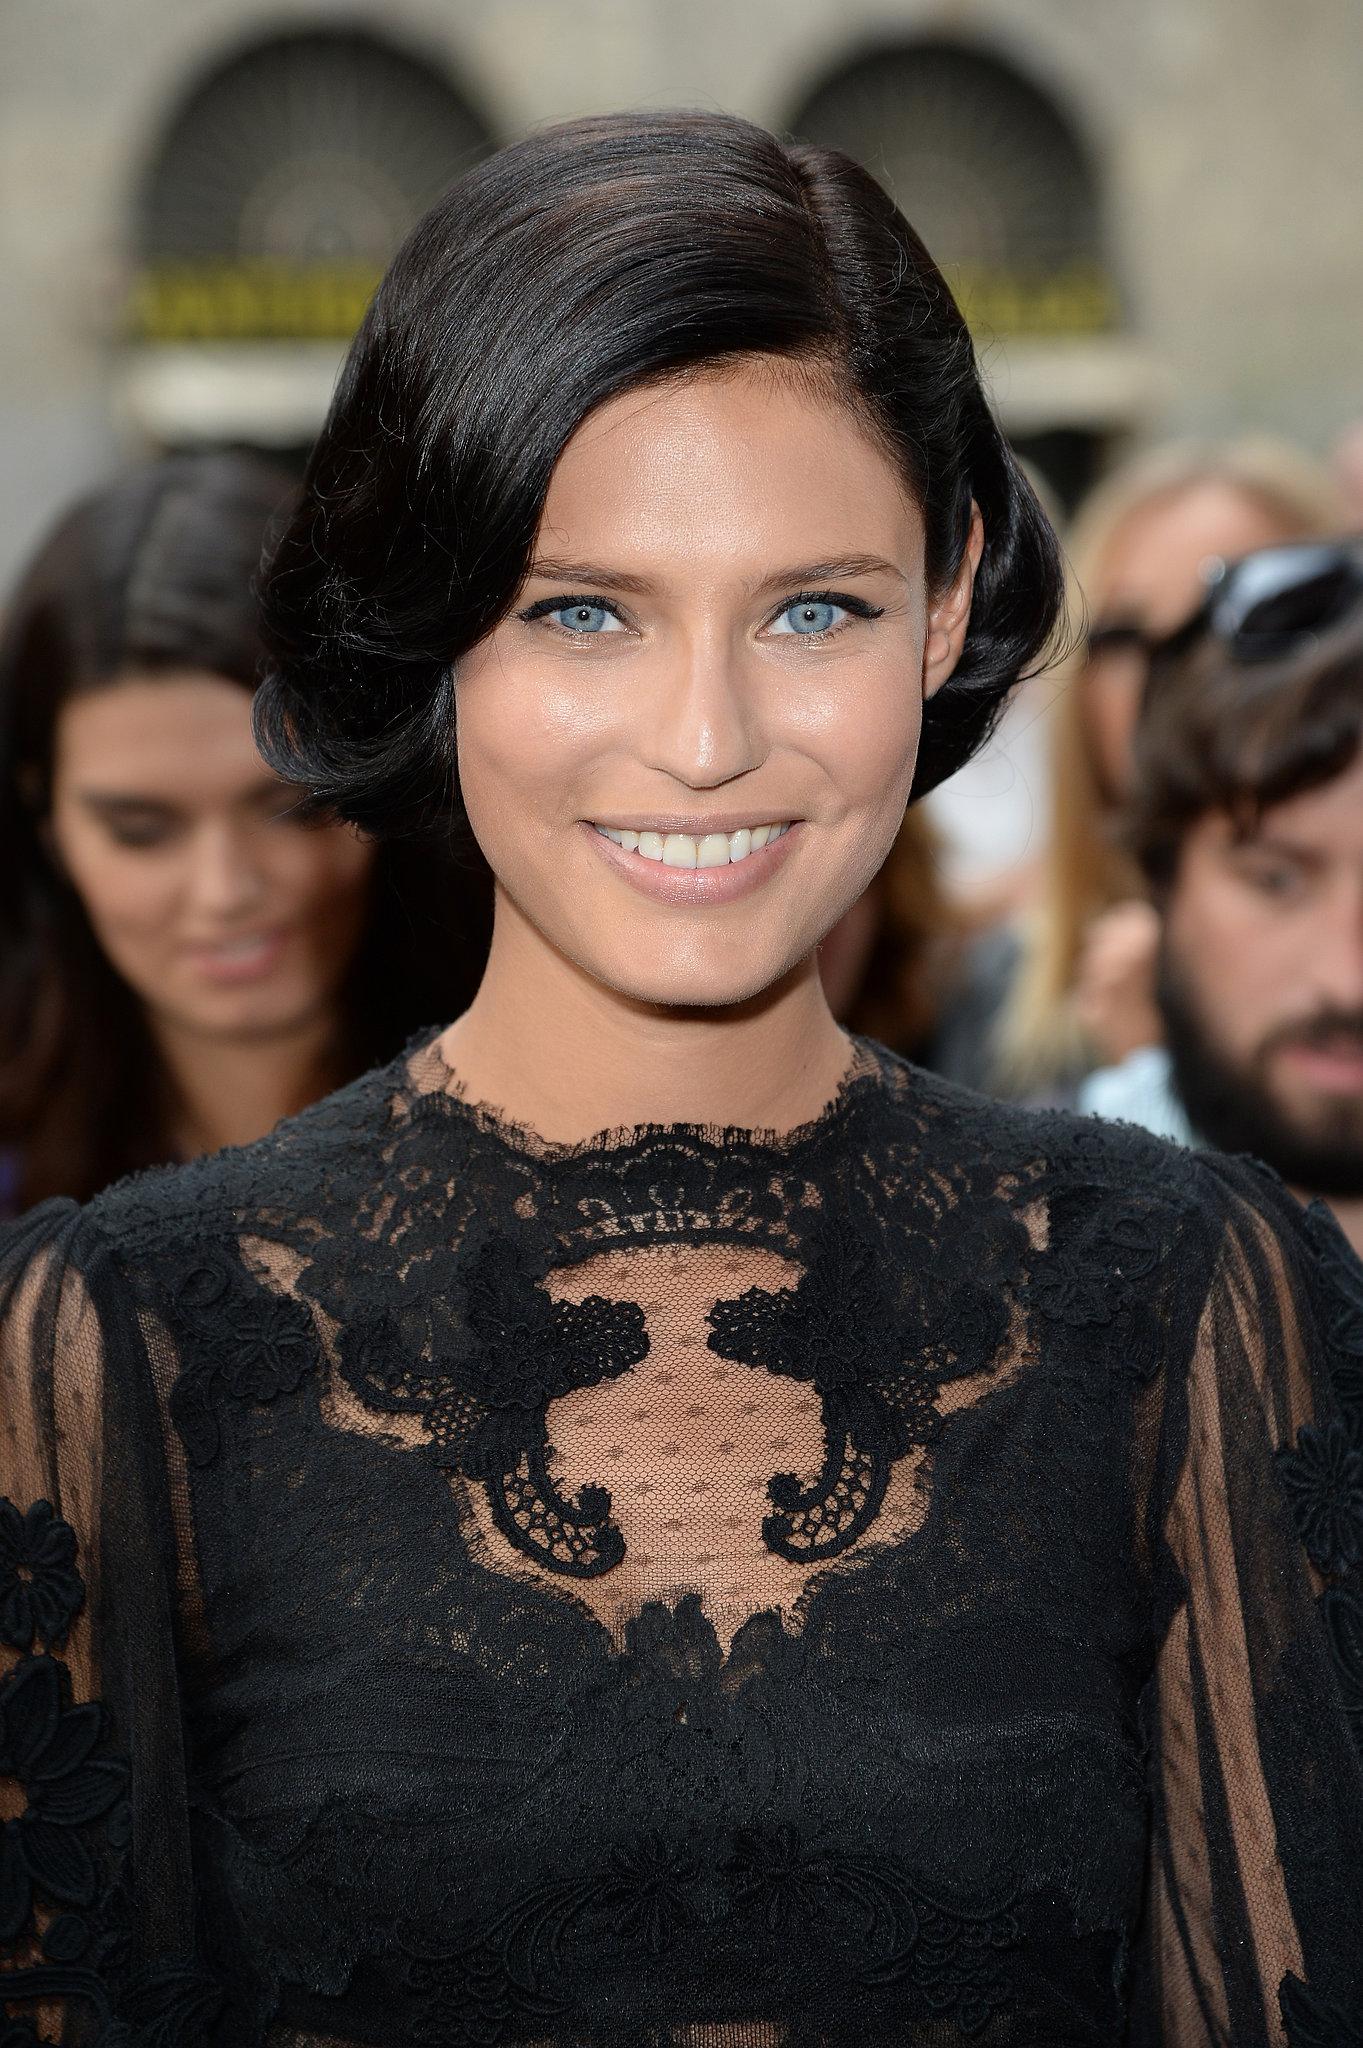 Bianca Balti at Dolce & Gabbana Spring 2014.